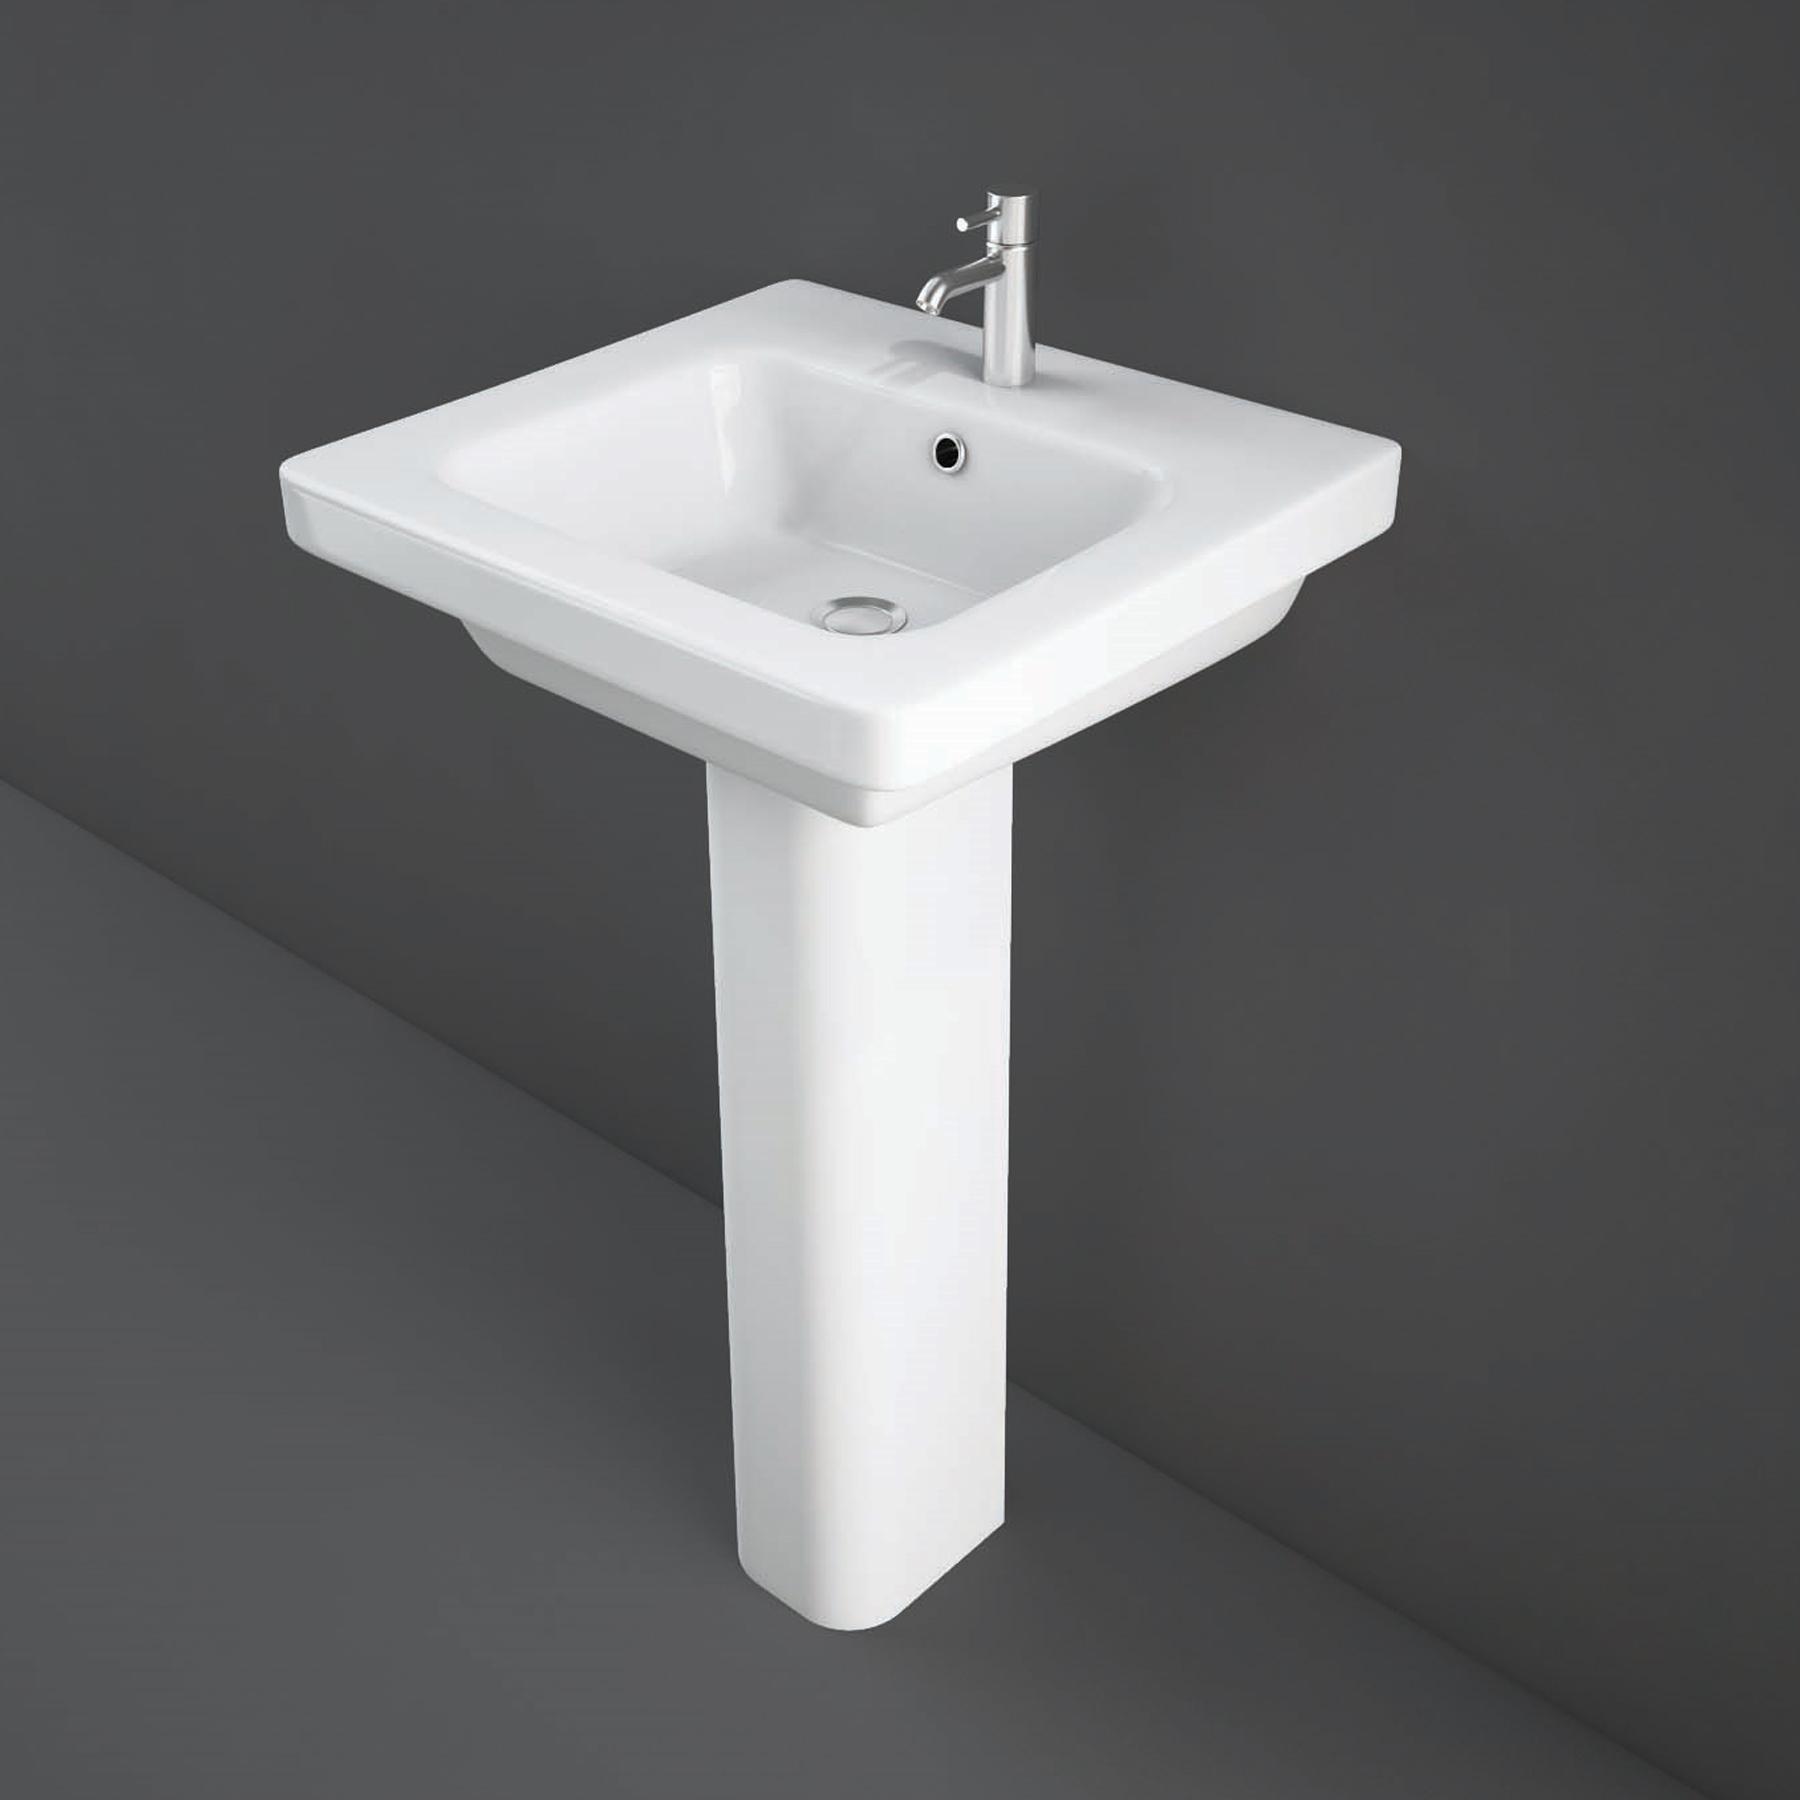 RAK Resort Wash Basin & Full Pedestal 500mm Wide 1 Tap Hole